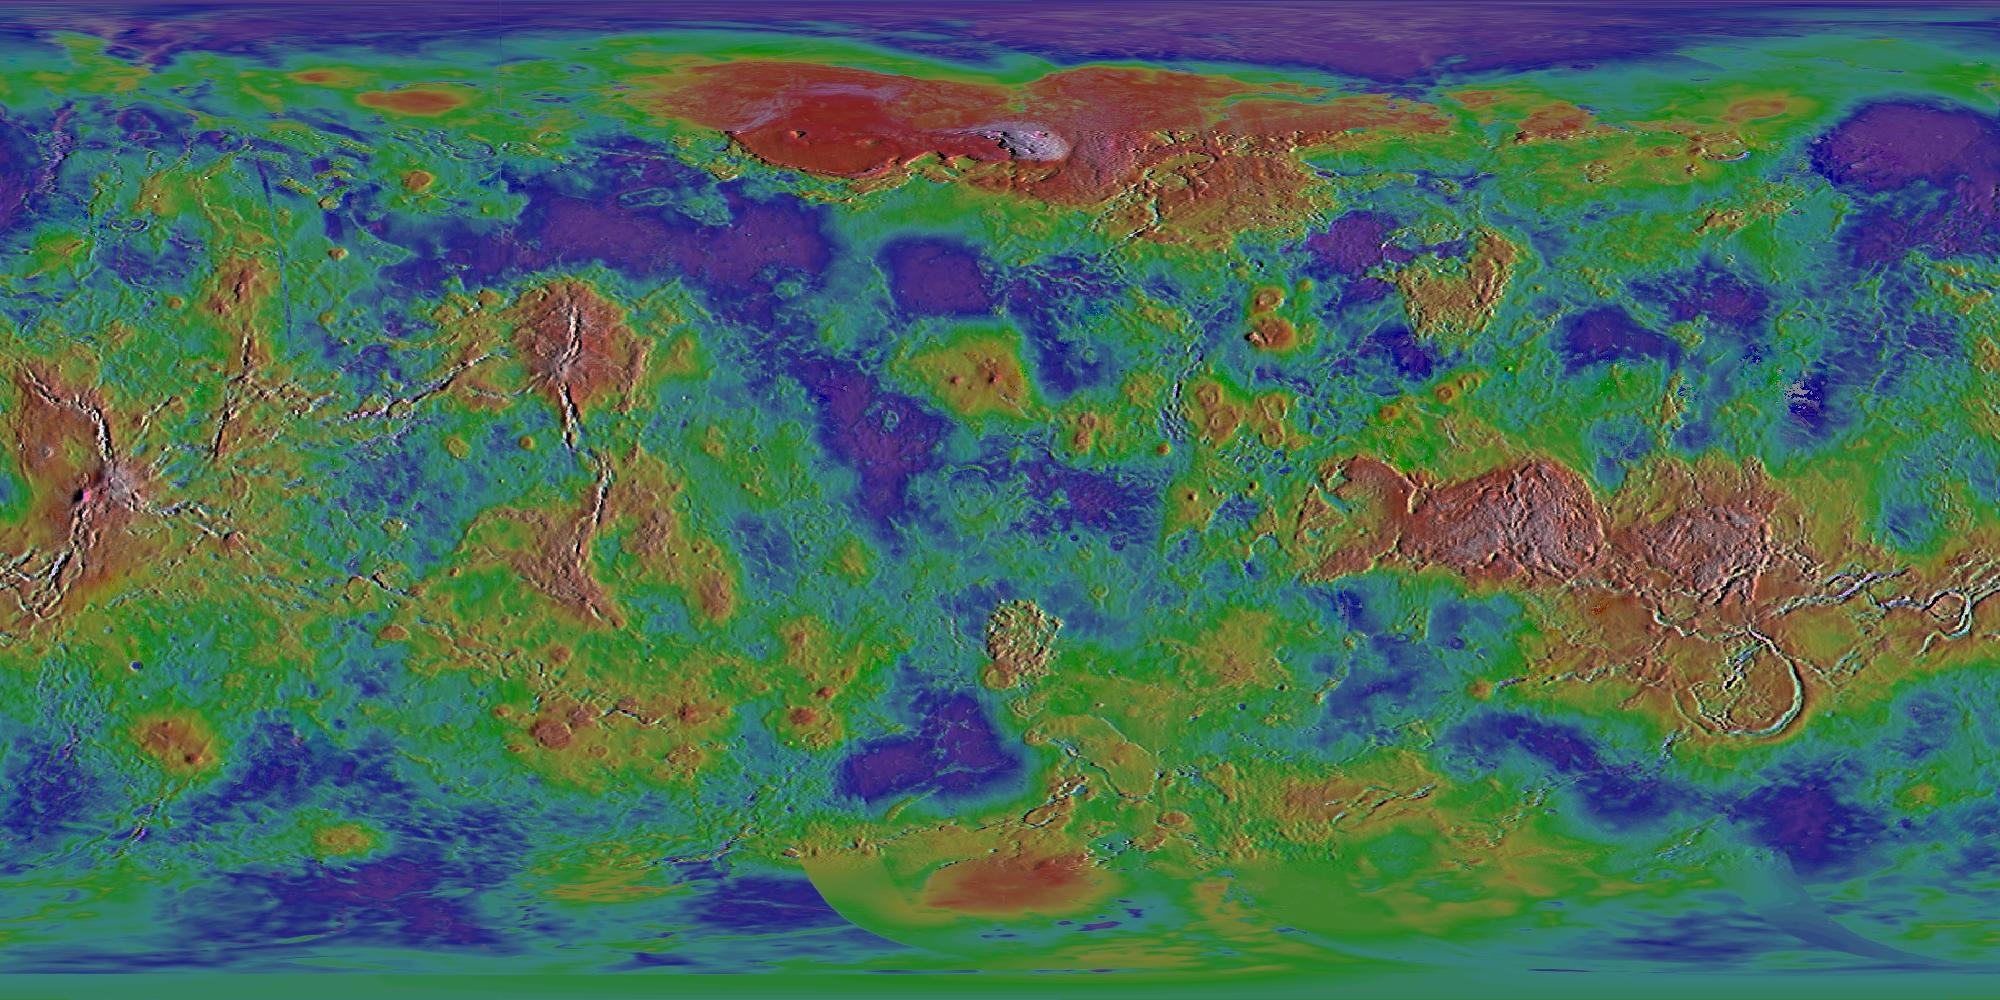 Geographic Pattern - Tectonic | Terraforming Wiki | FANDOM ... on map of mars, terraforming mercury, see mercury, map of planet venus, us map of the mercury, surface of mercury,